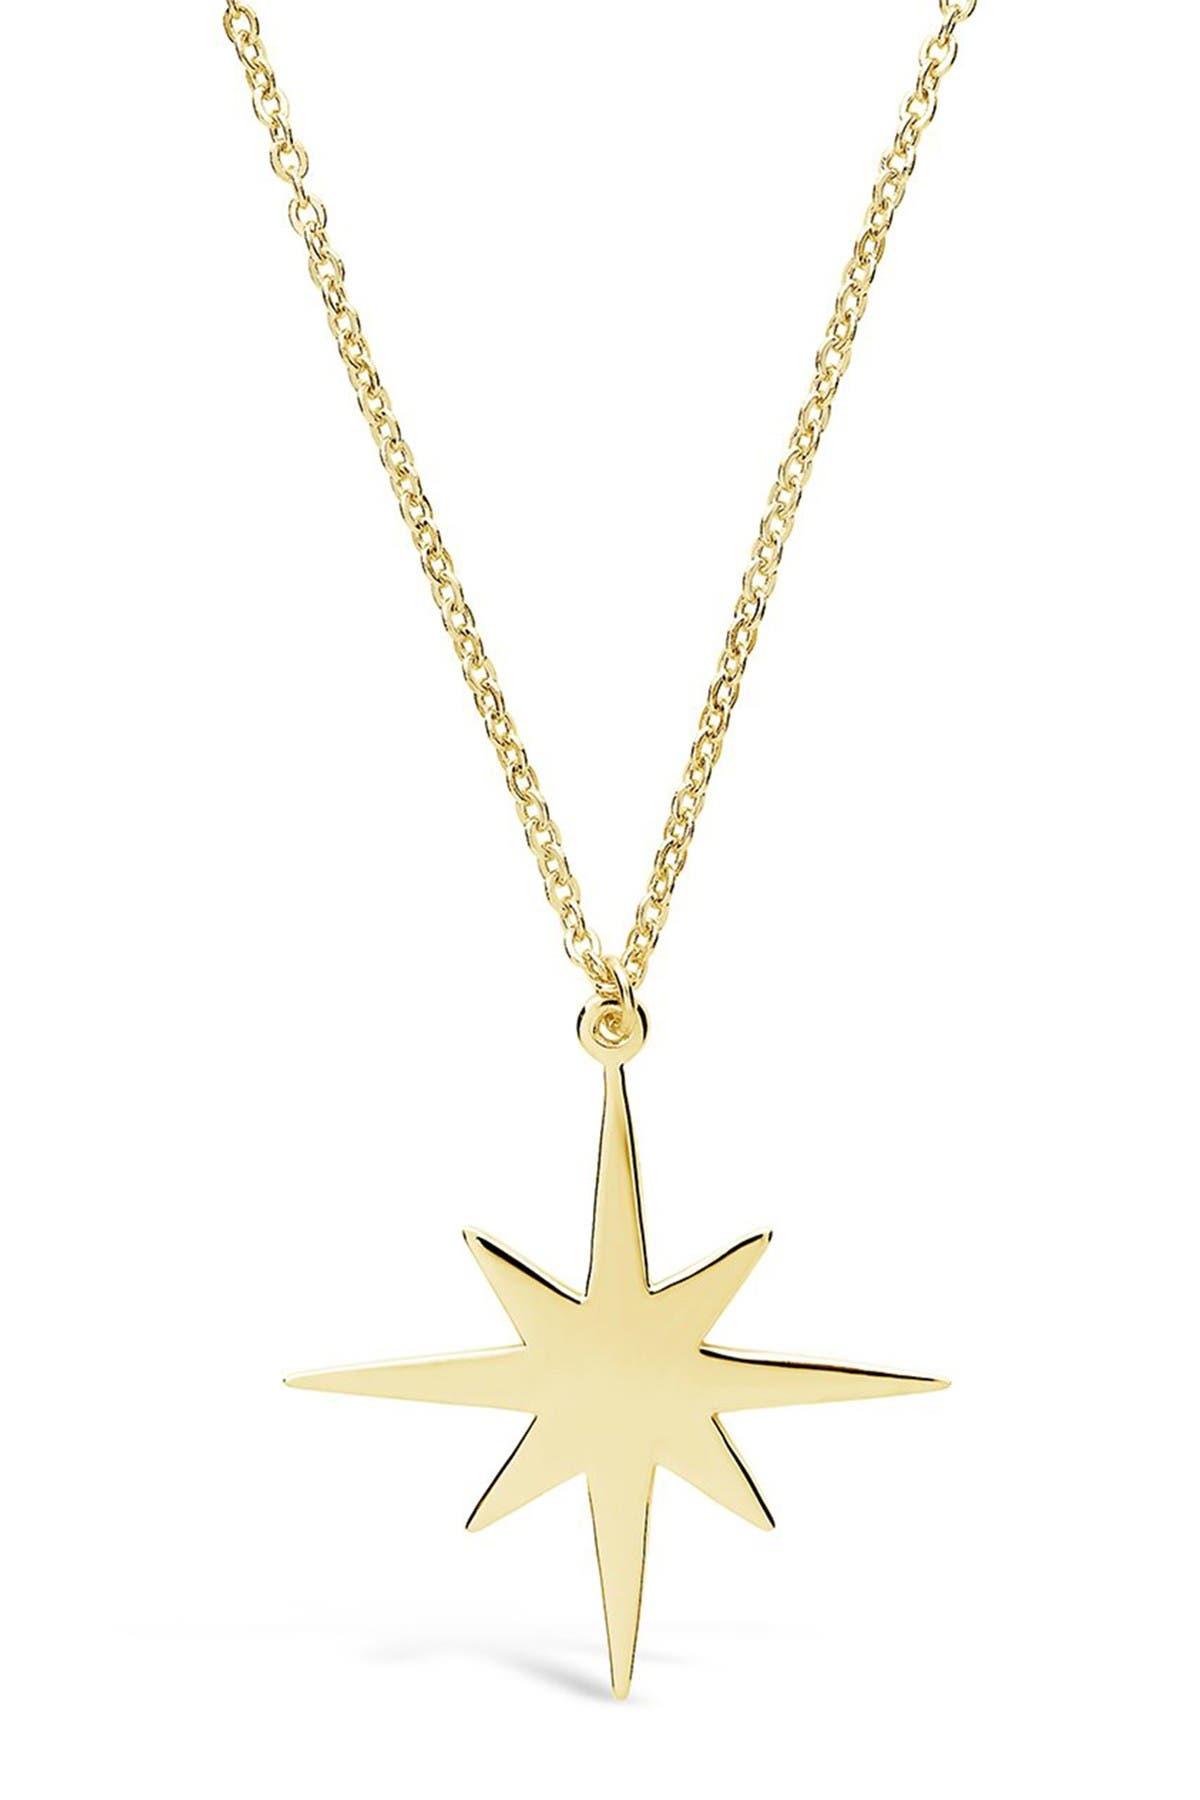 Image of Sterling Forever 14K Gold Vermeil Plated Sterling Silver Bursting Star Pendant Necklace